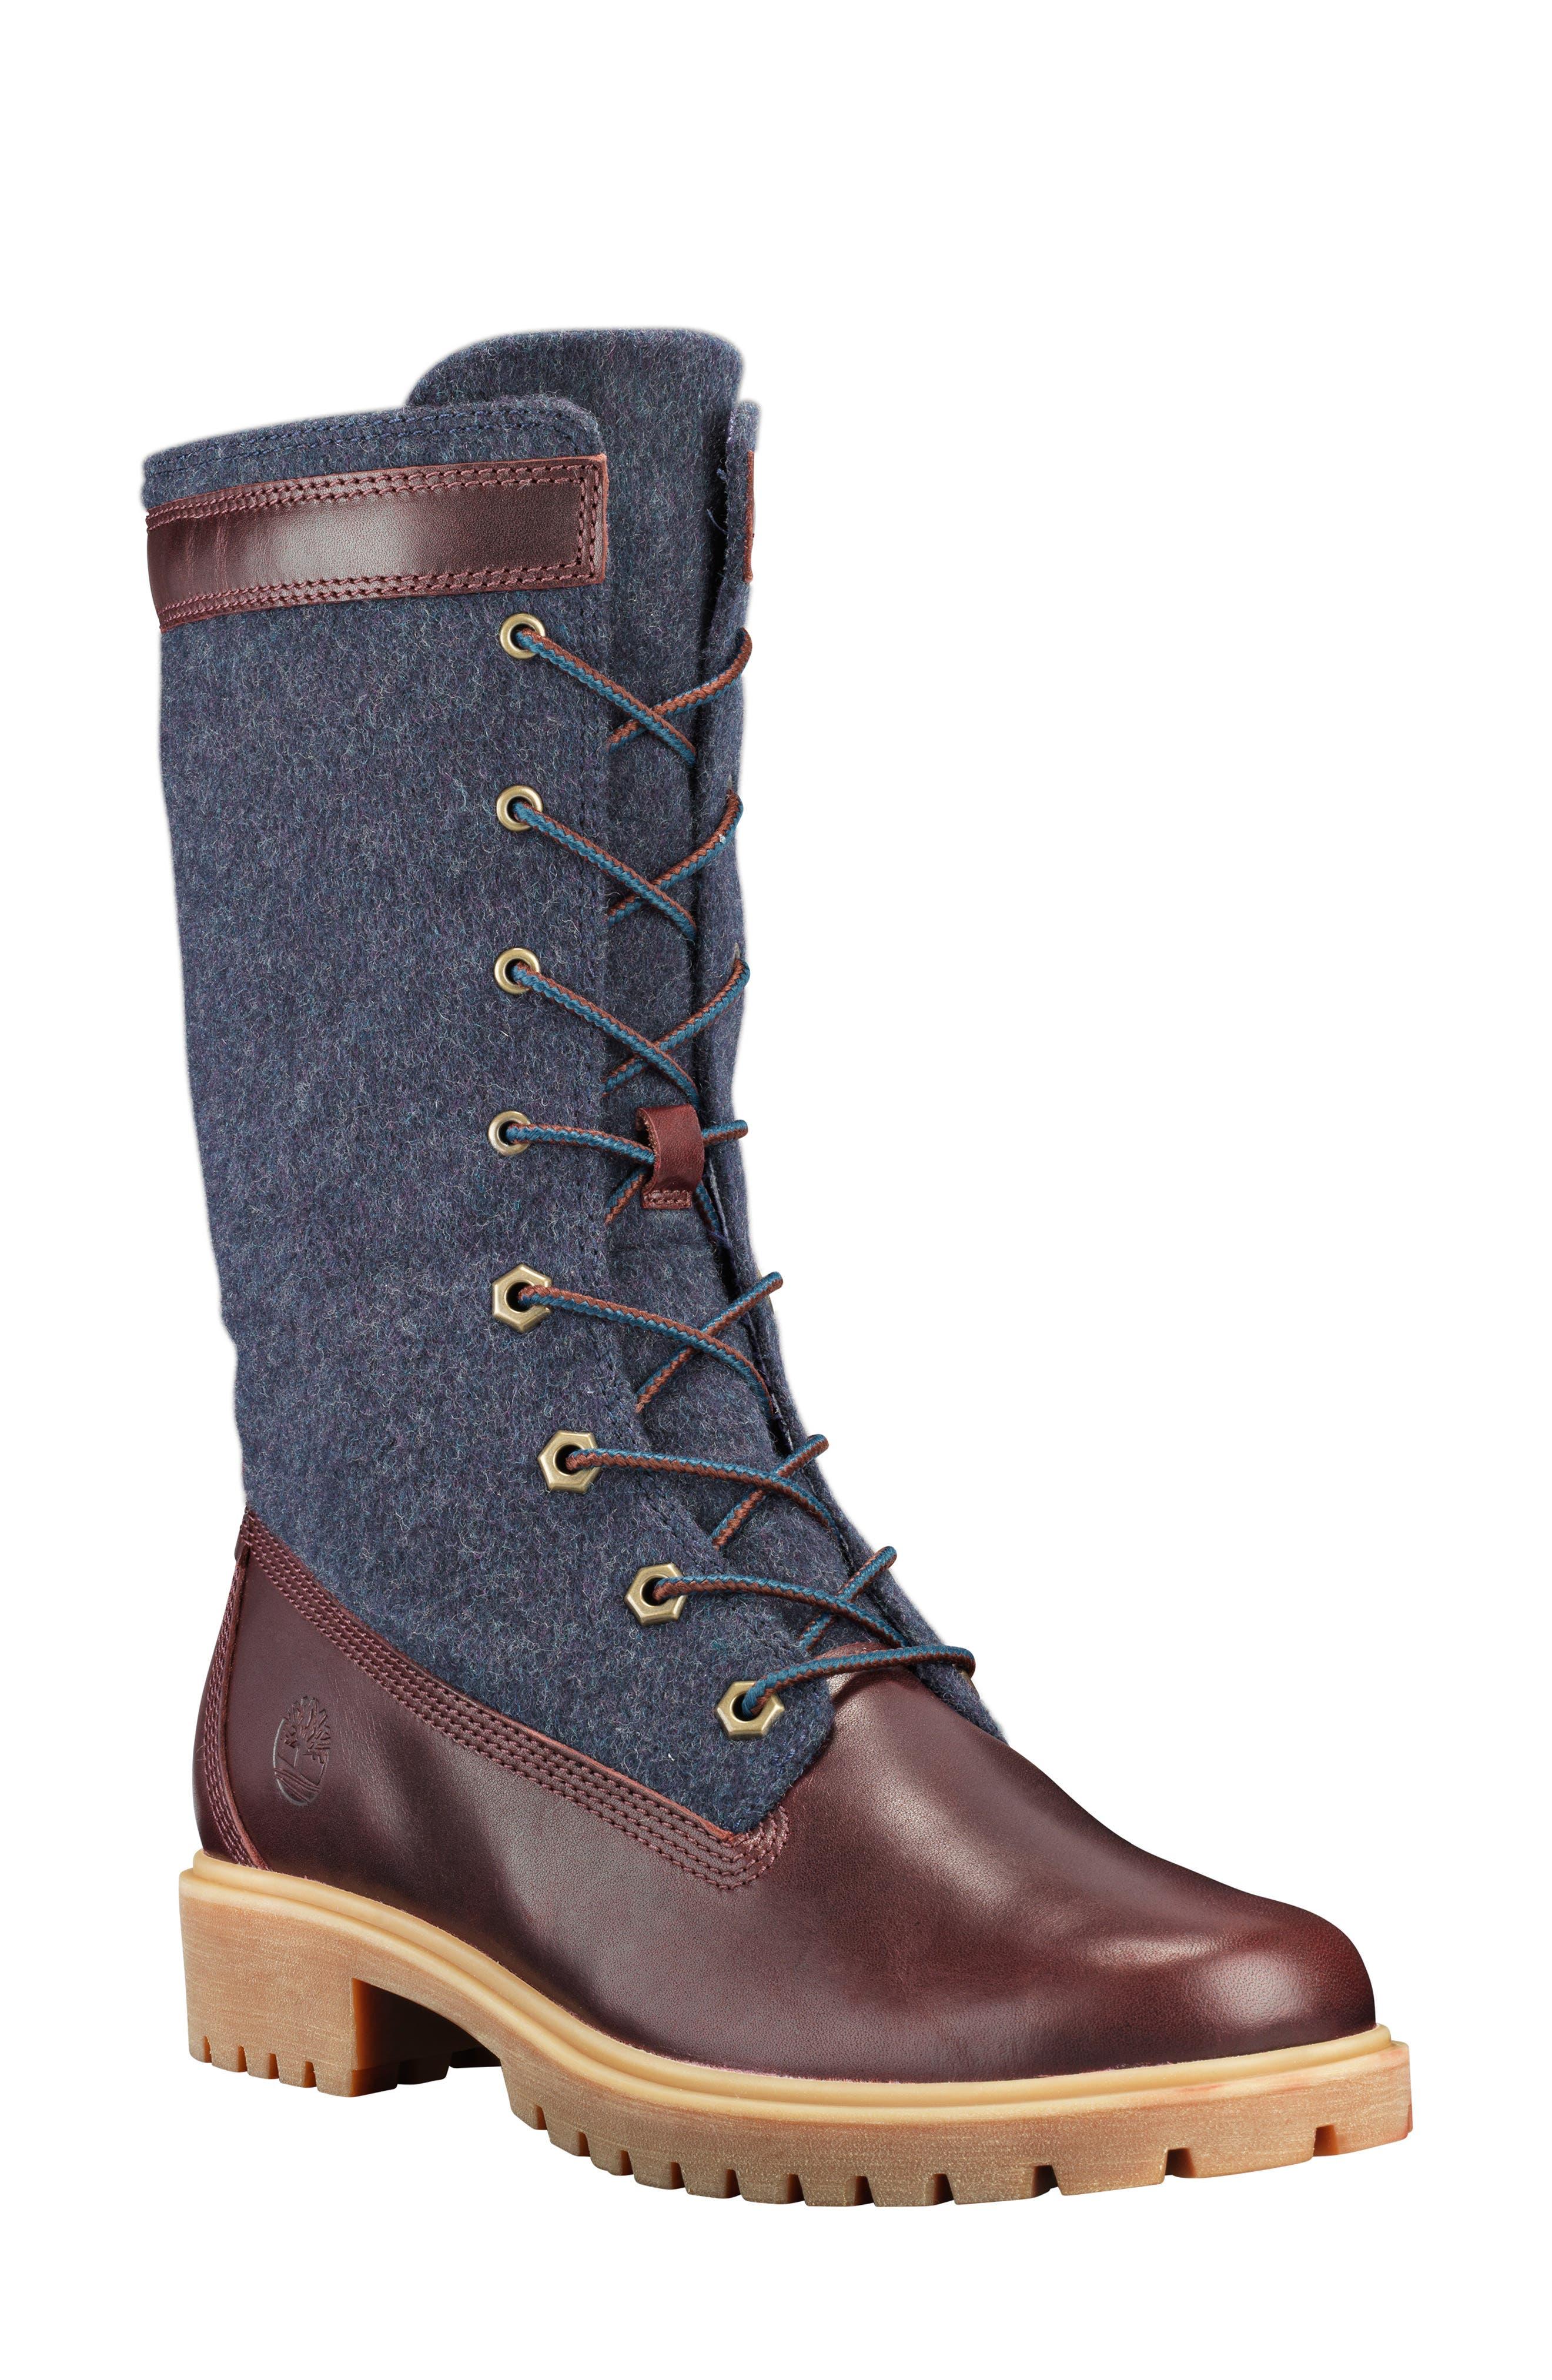 Timberland Jayne Waterproof Gaiter Boot- Burgundy